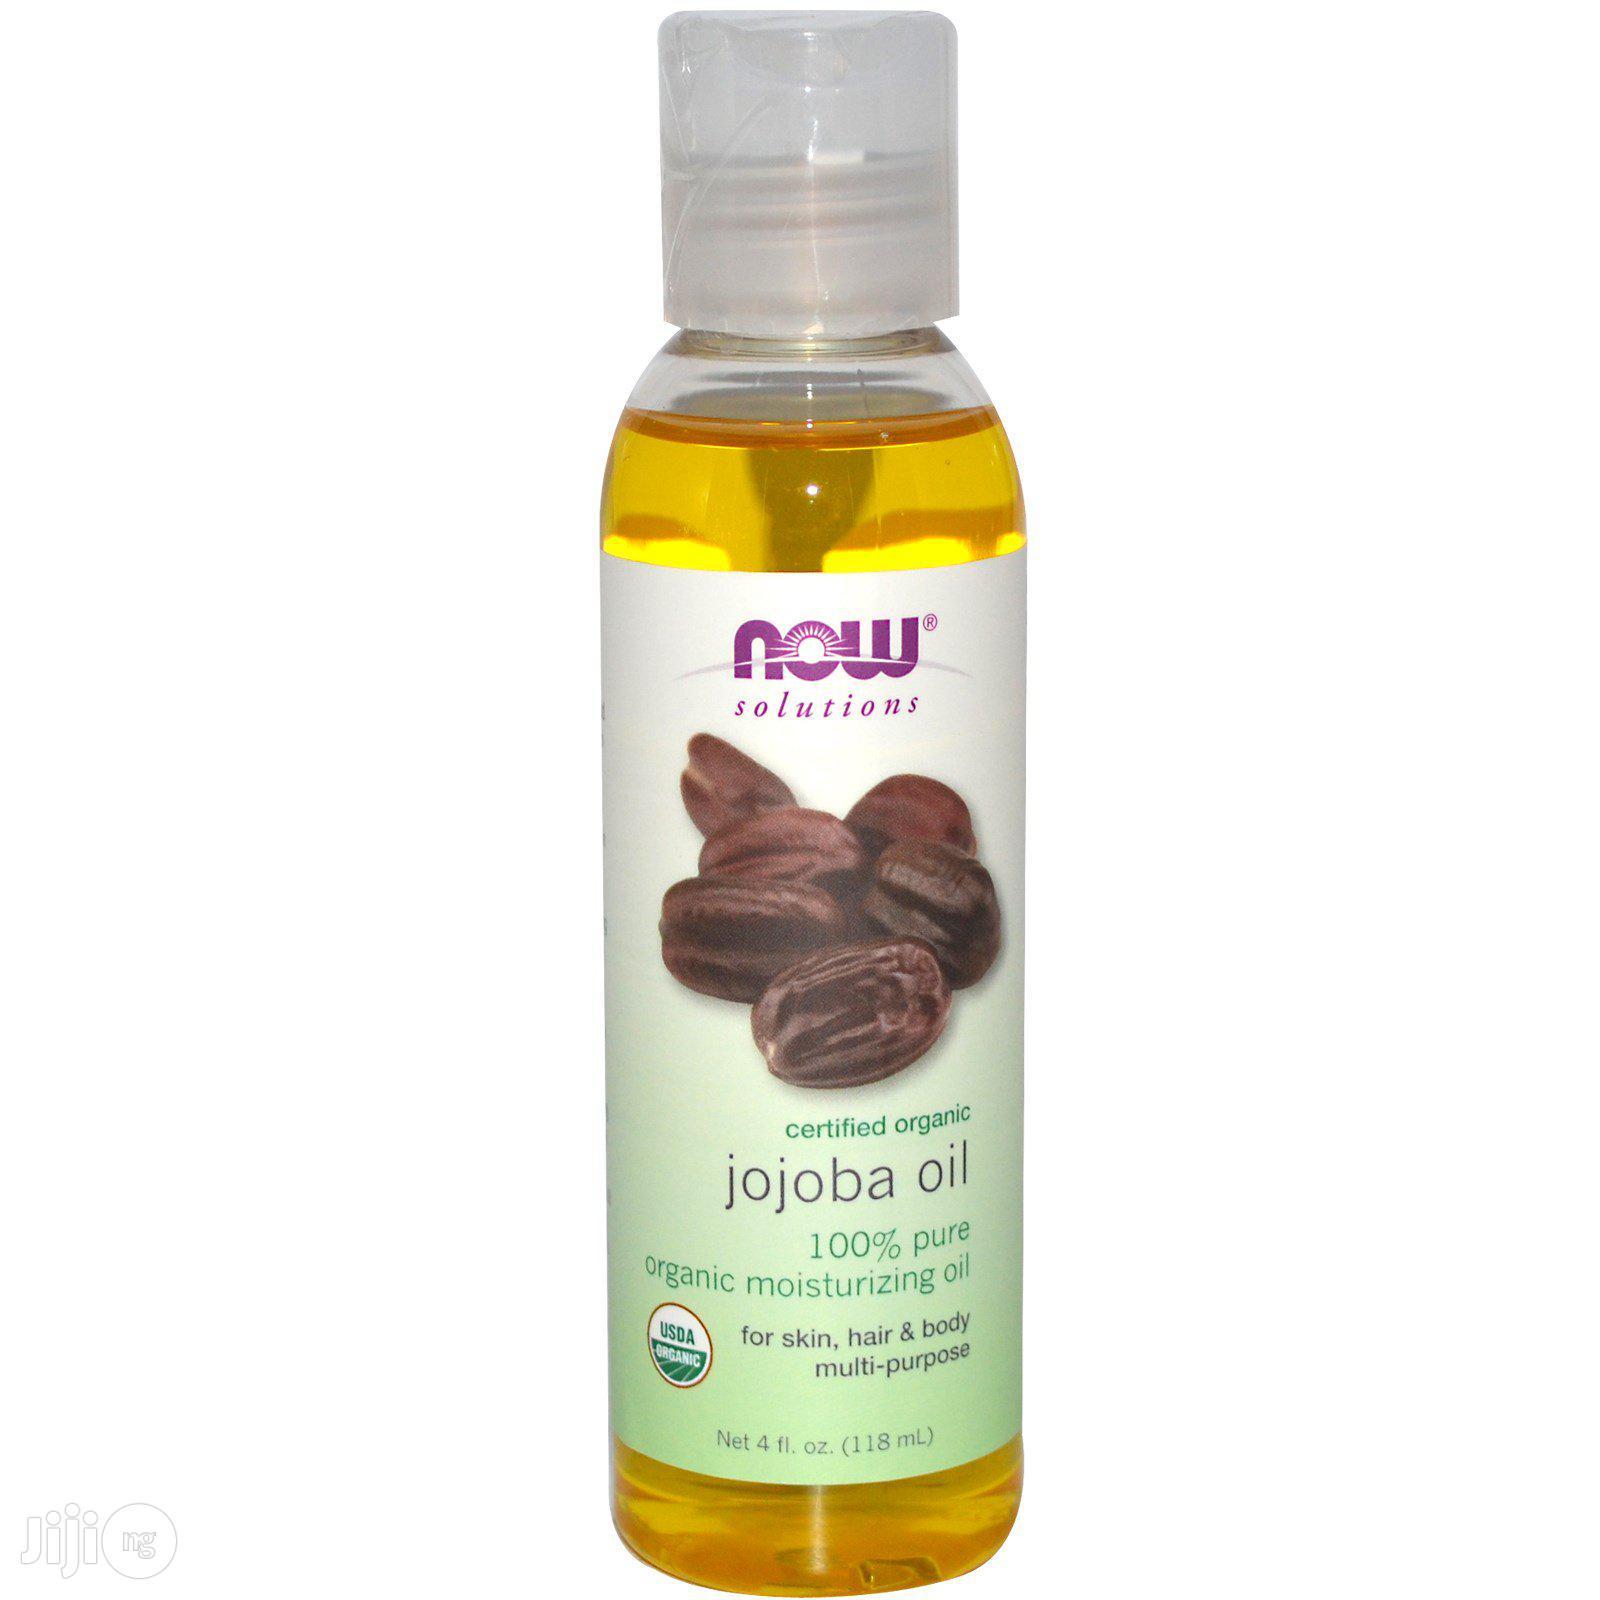 Organic Jojoba Oil, 4-Ounce in Lagos State - Skin Care, kaampe | Jiji.ng